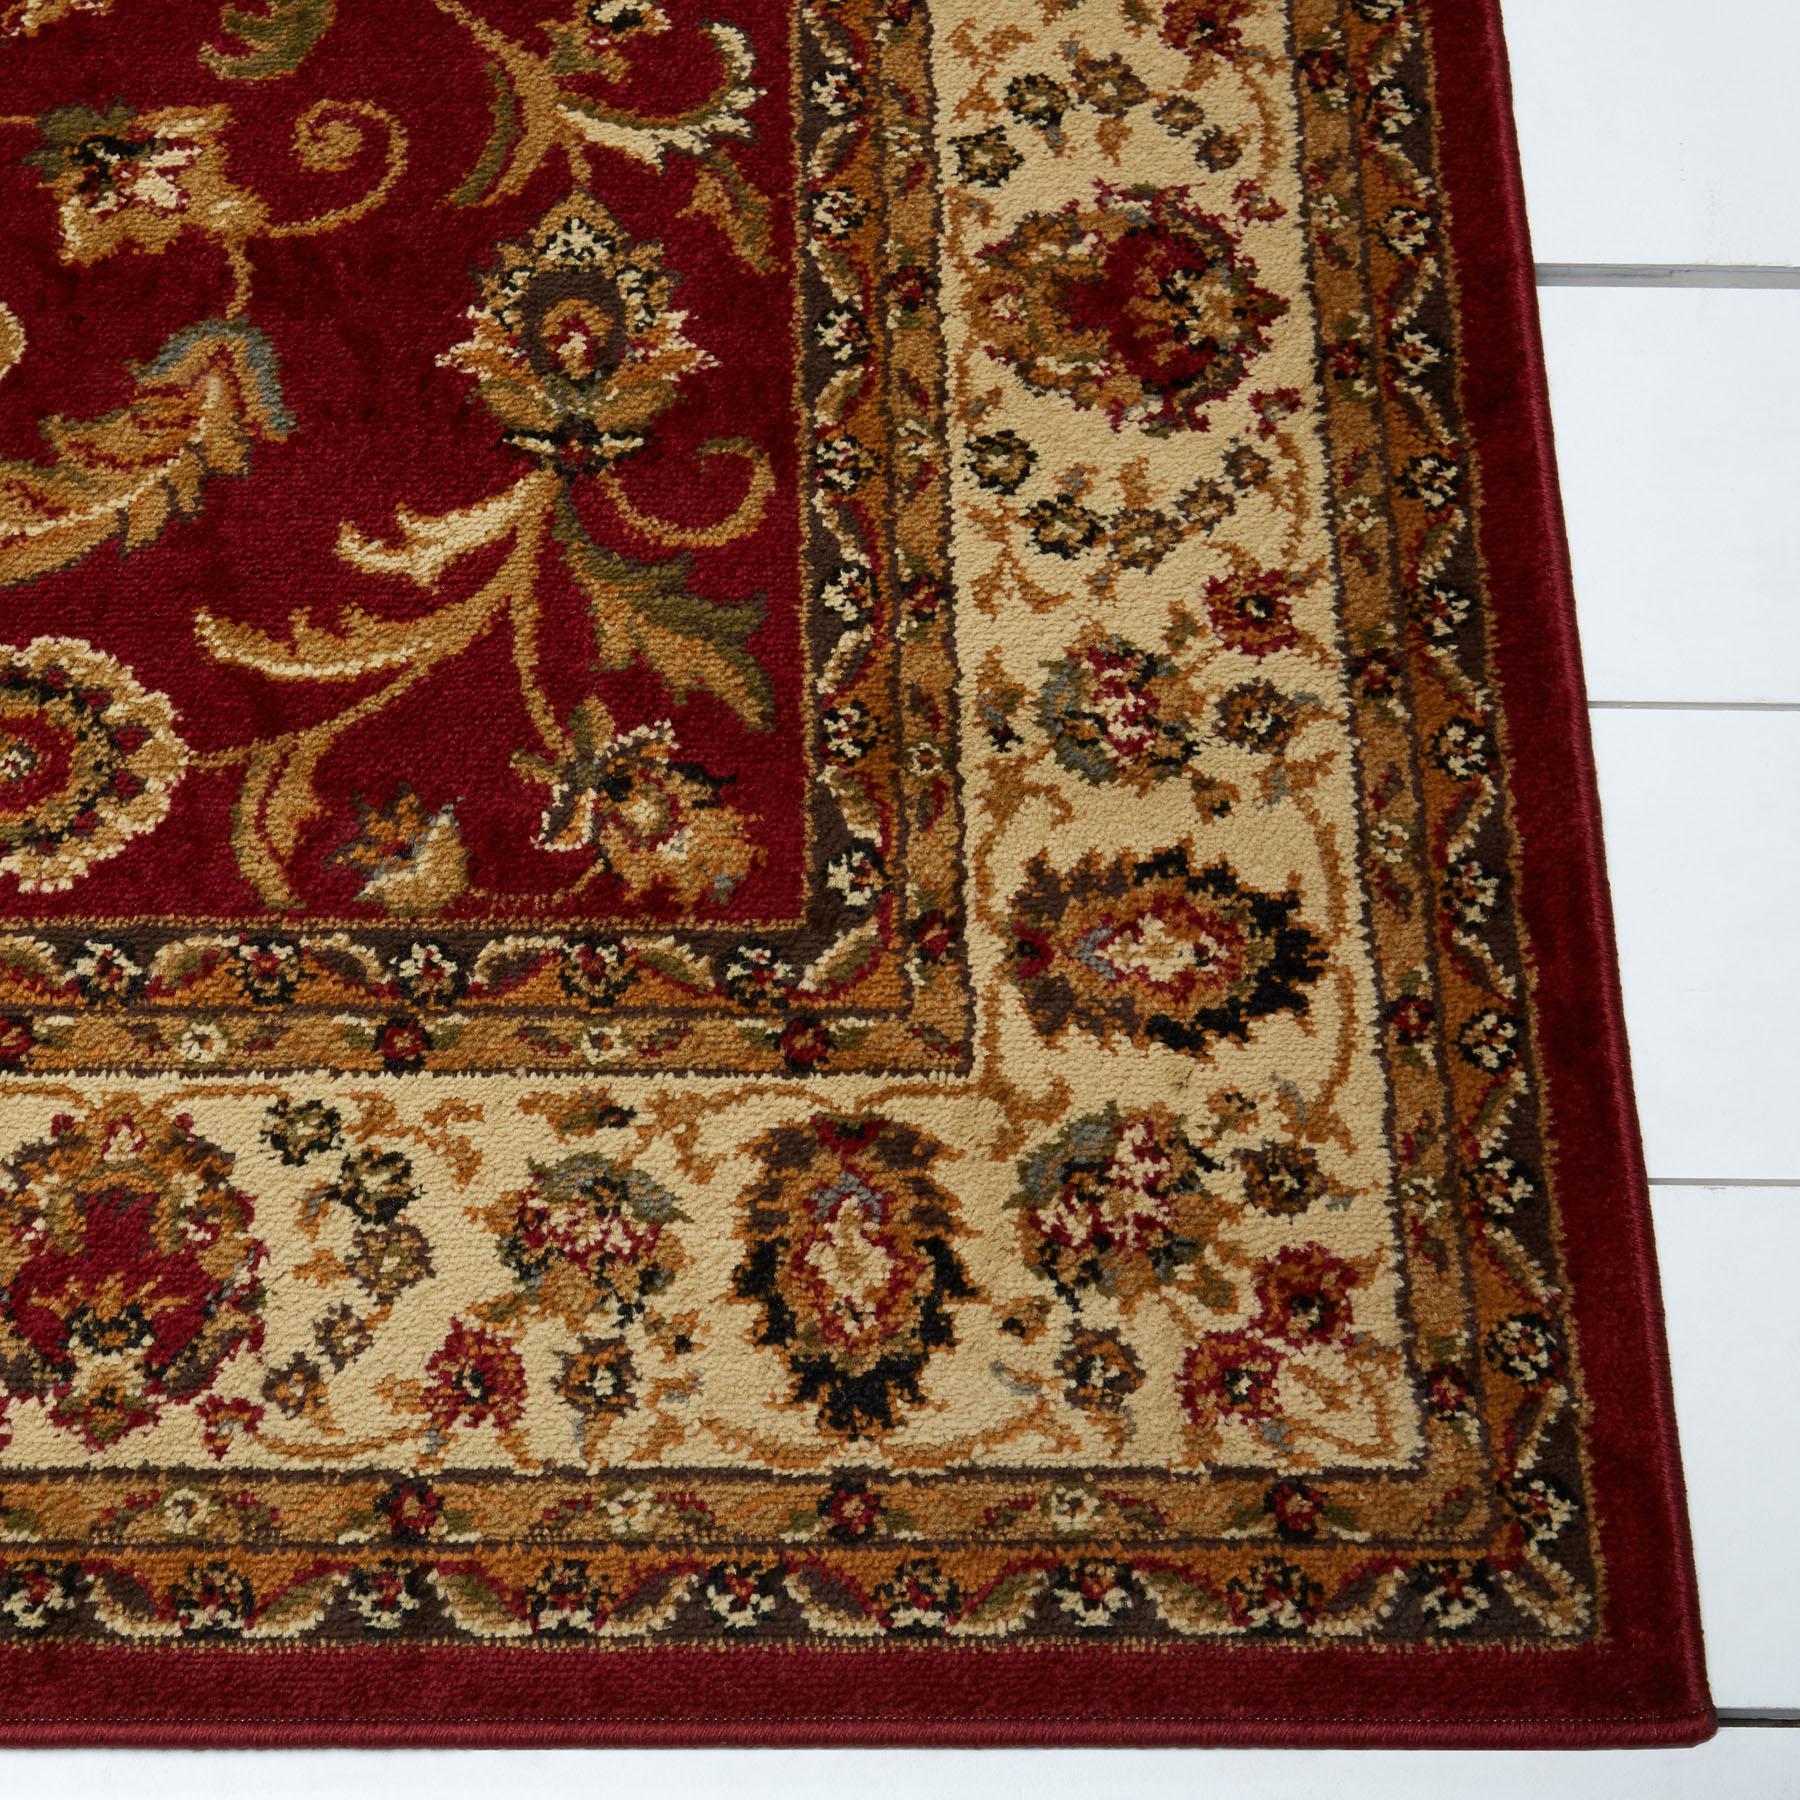 Red Burgundy Ivory Bordered Traditional Area Rug Persien Oriental Floral Carpet Ebay